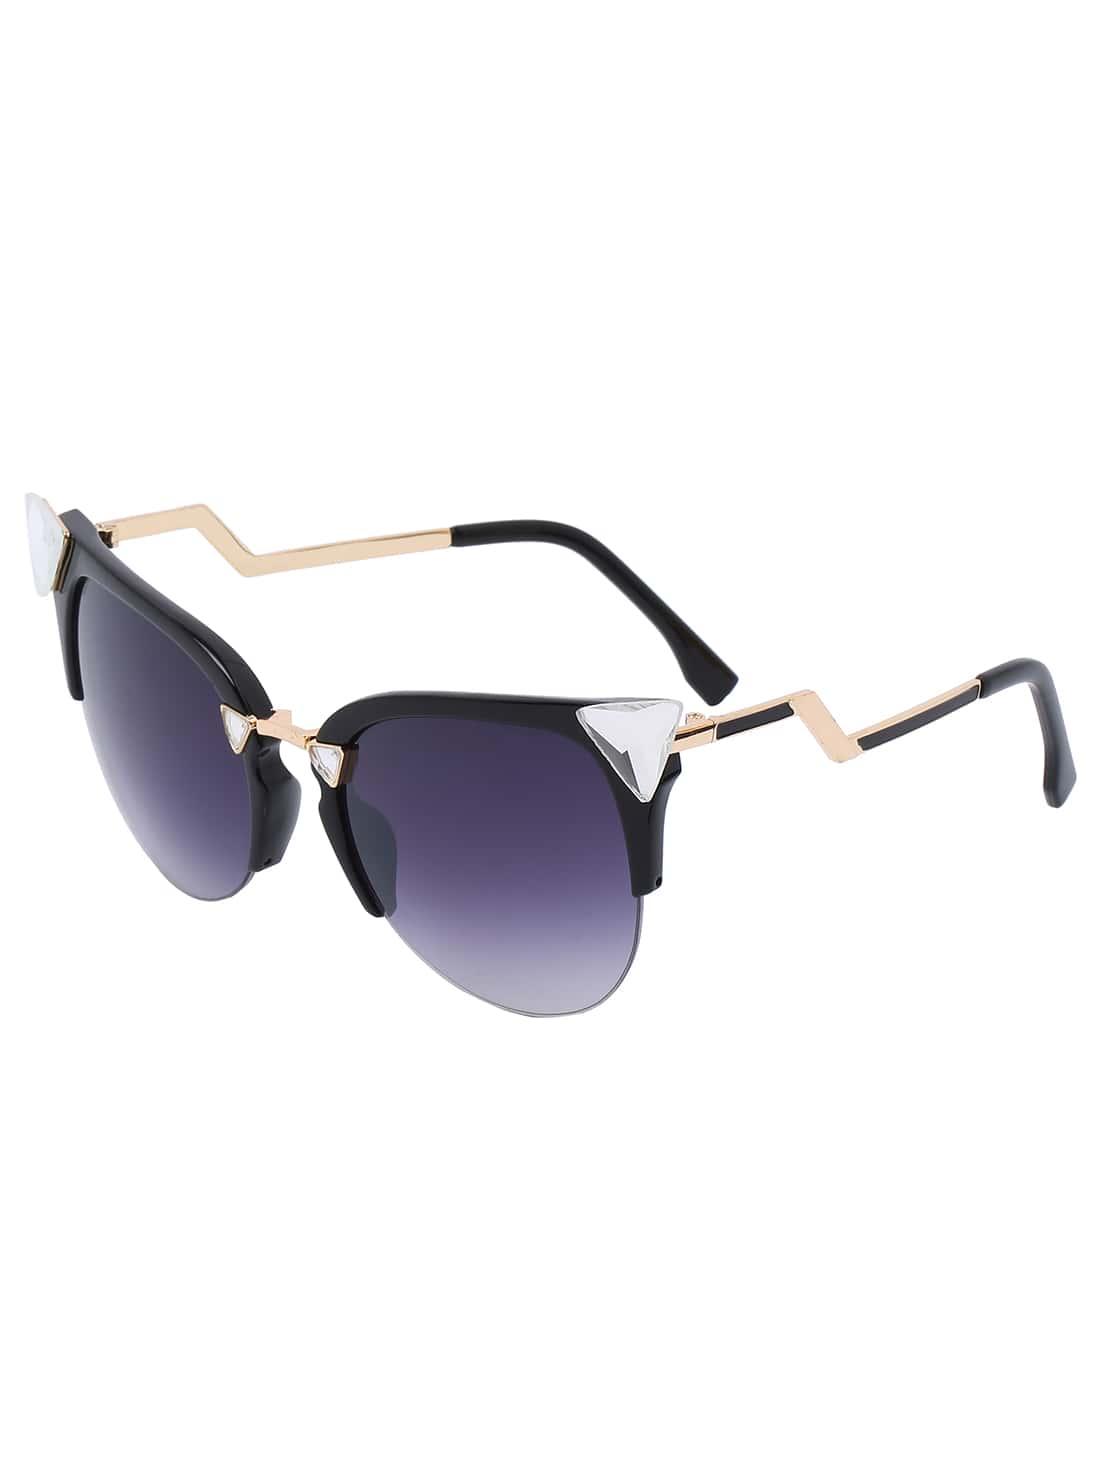 Black Half Frame Glasses : Black Half Frame Rhinestone Featured Sunglasses -SheIn ...